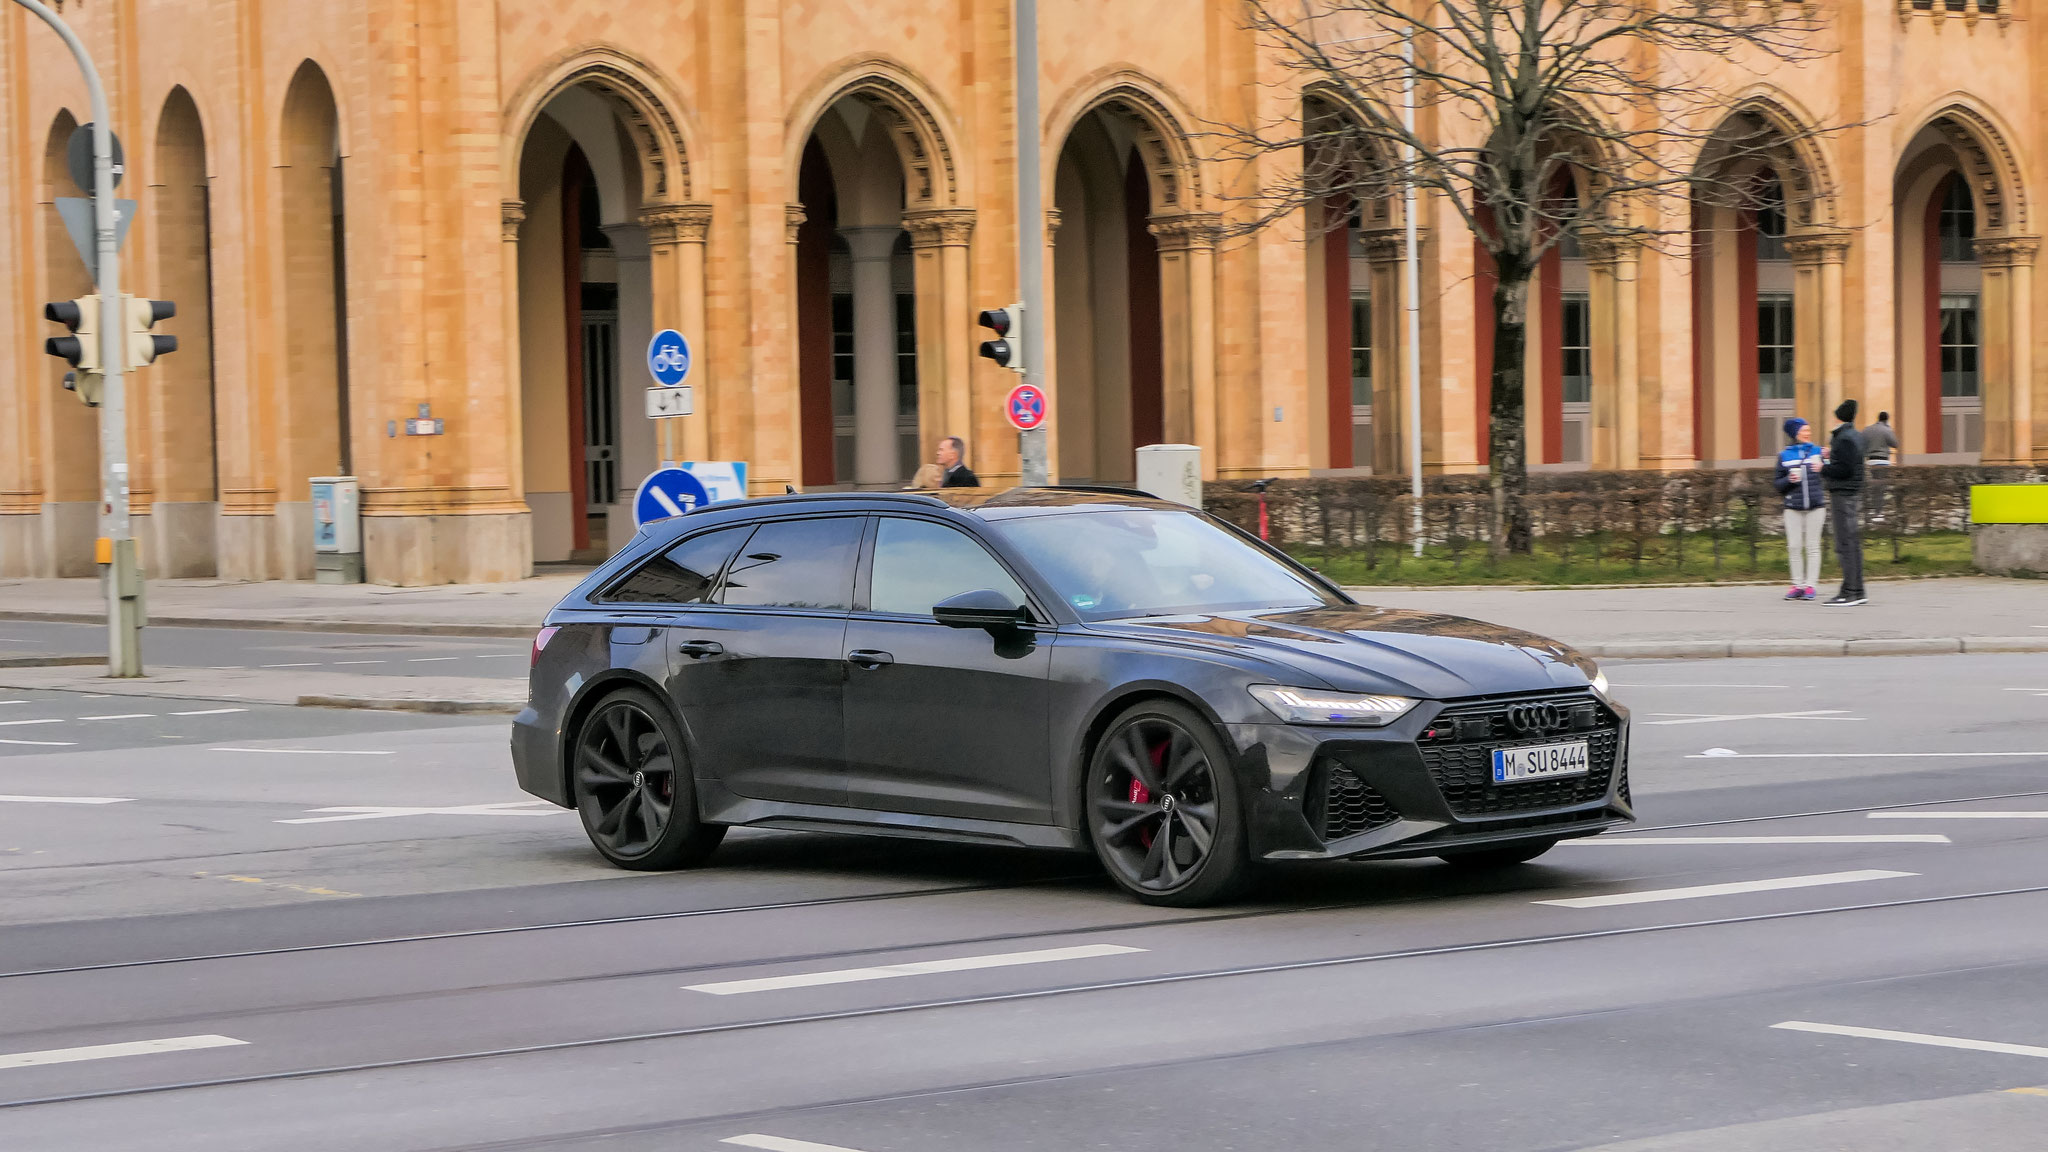 Audi RS6 - M-SU-8444